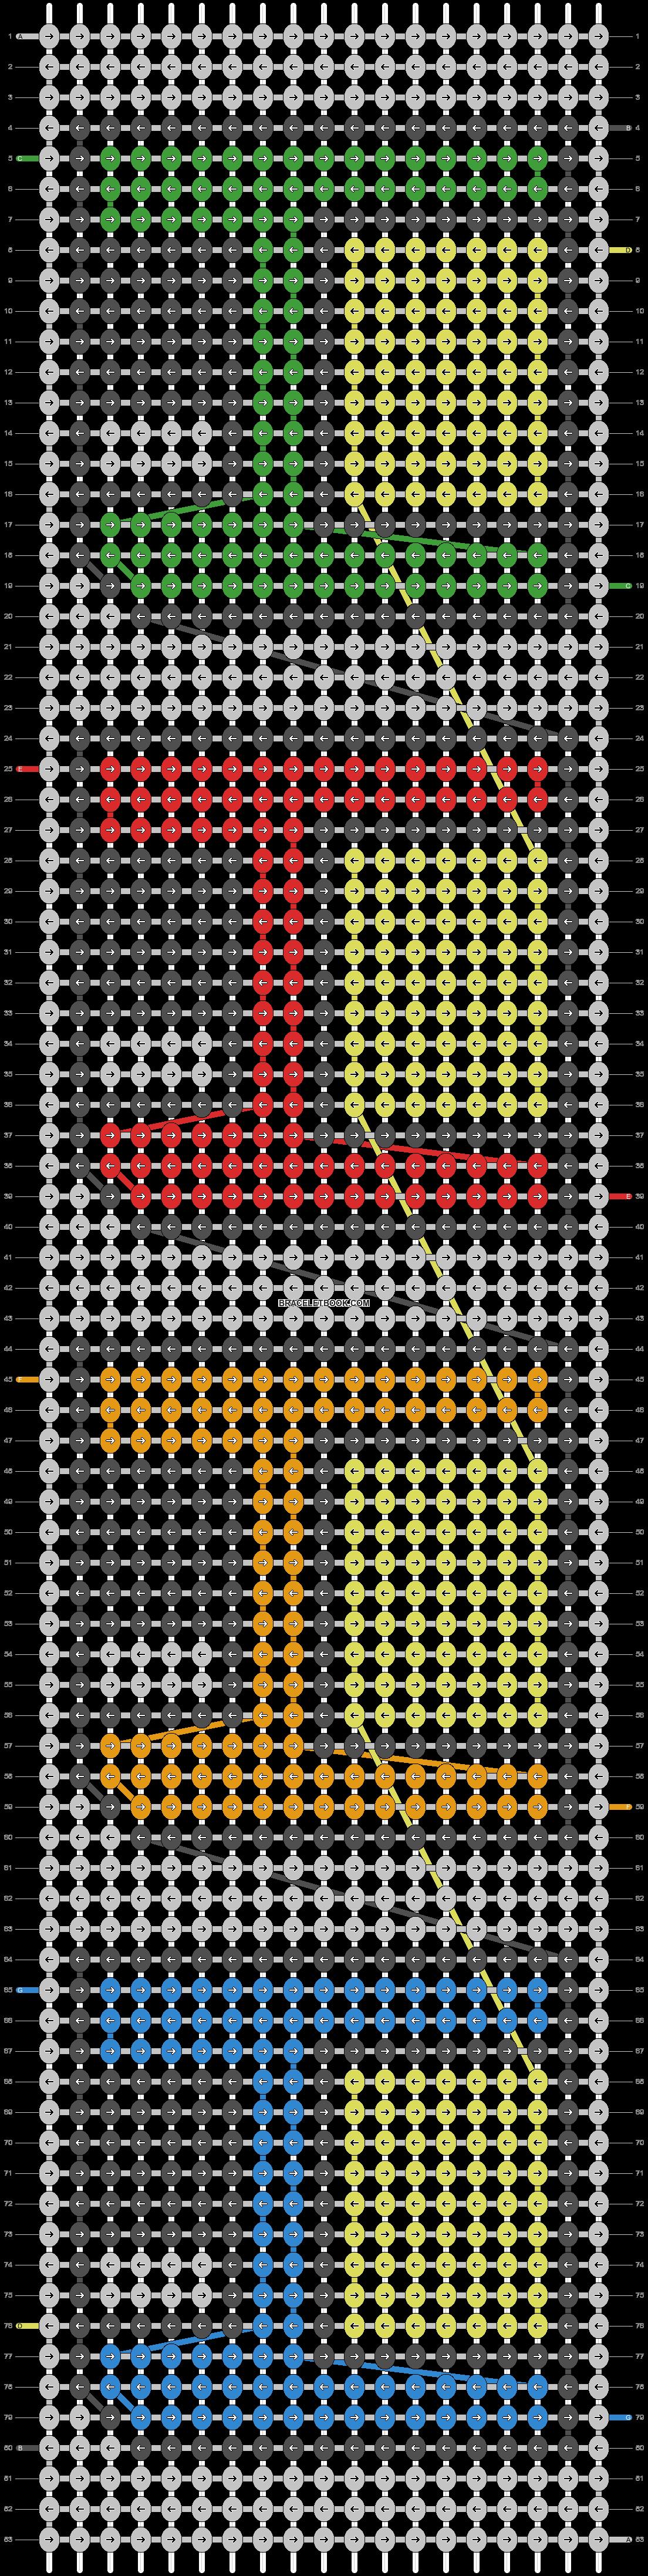 Alpha Pattern #21903 added by biancaplem